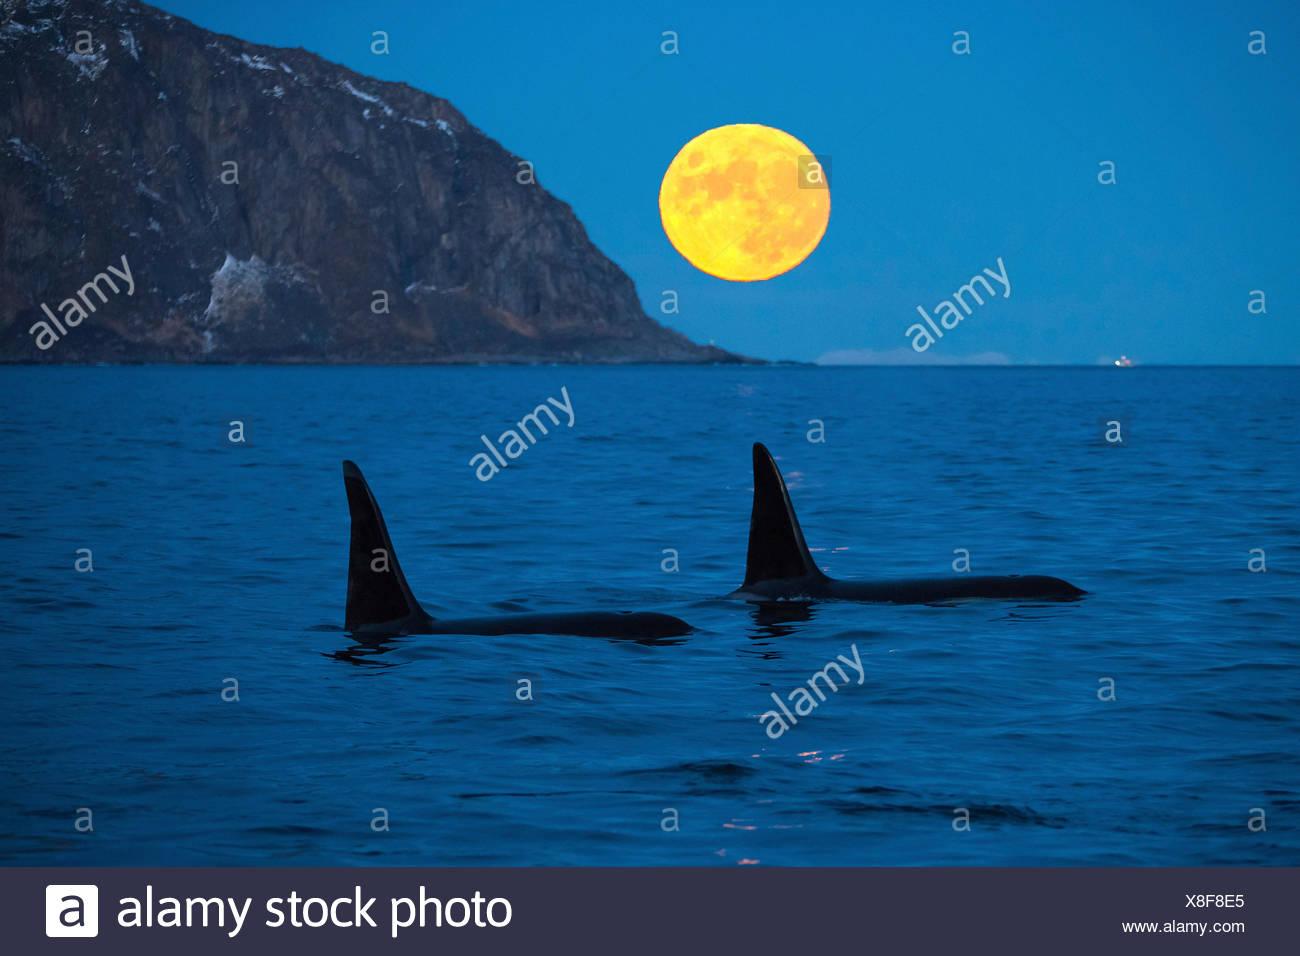 Schwertwal, Killerwal, Orca (Orcinus orca), zwei grosse Bullen vor aufgehendem Vollmond in der Daemmerung, Norwegen, Troms, Berg Stock Photo